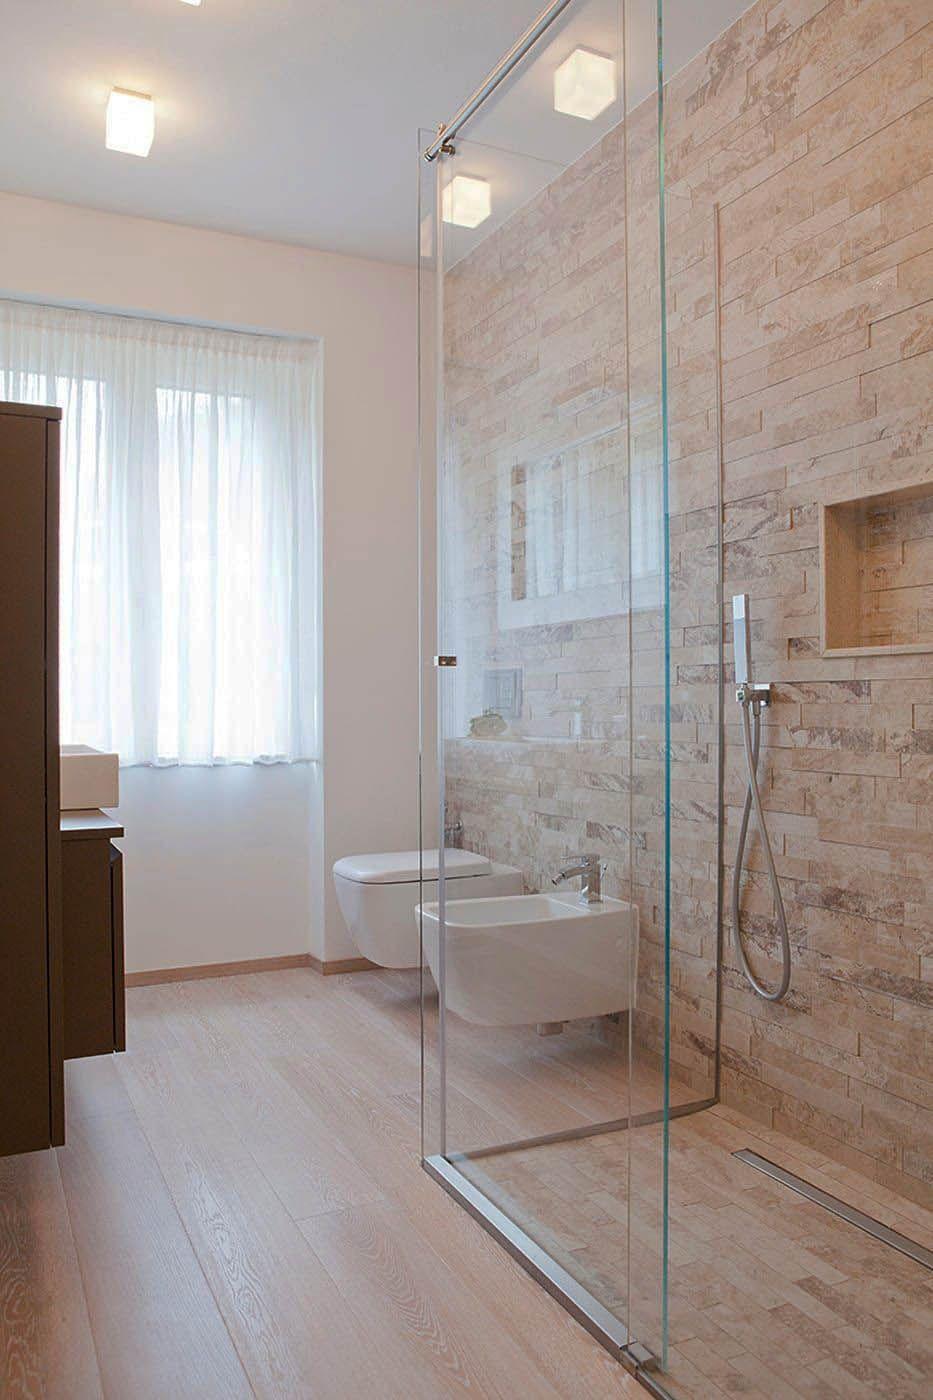 Real Home Inspiration bathroom wall decor at kohls to